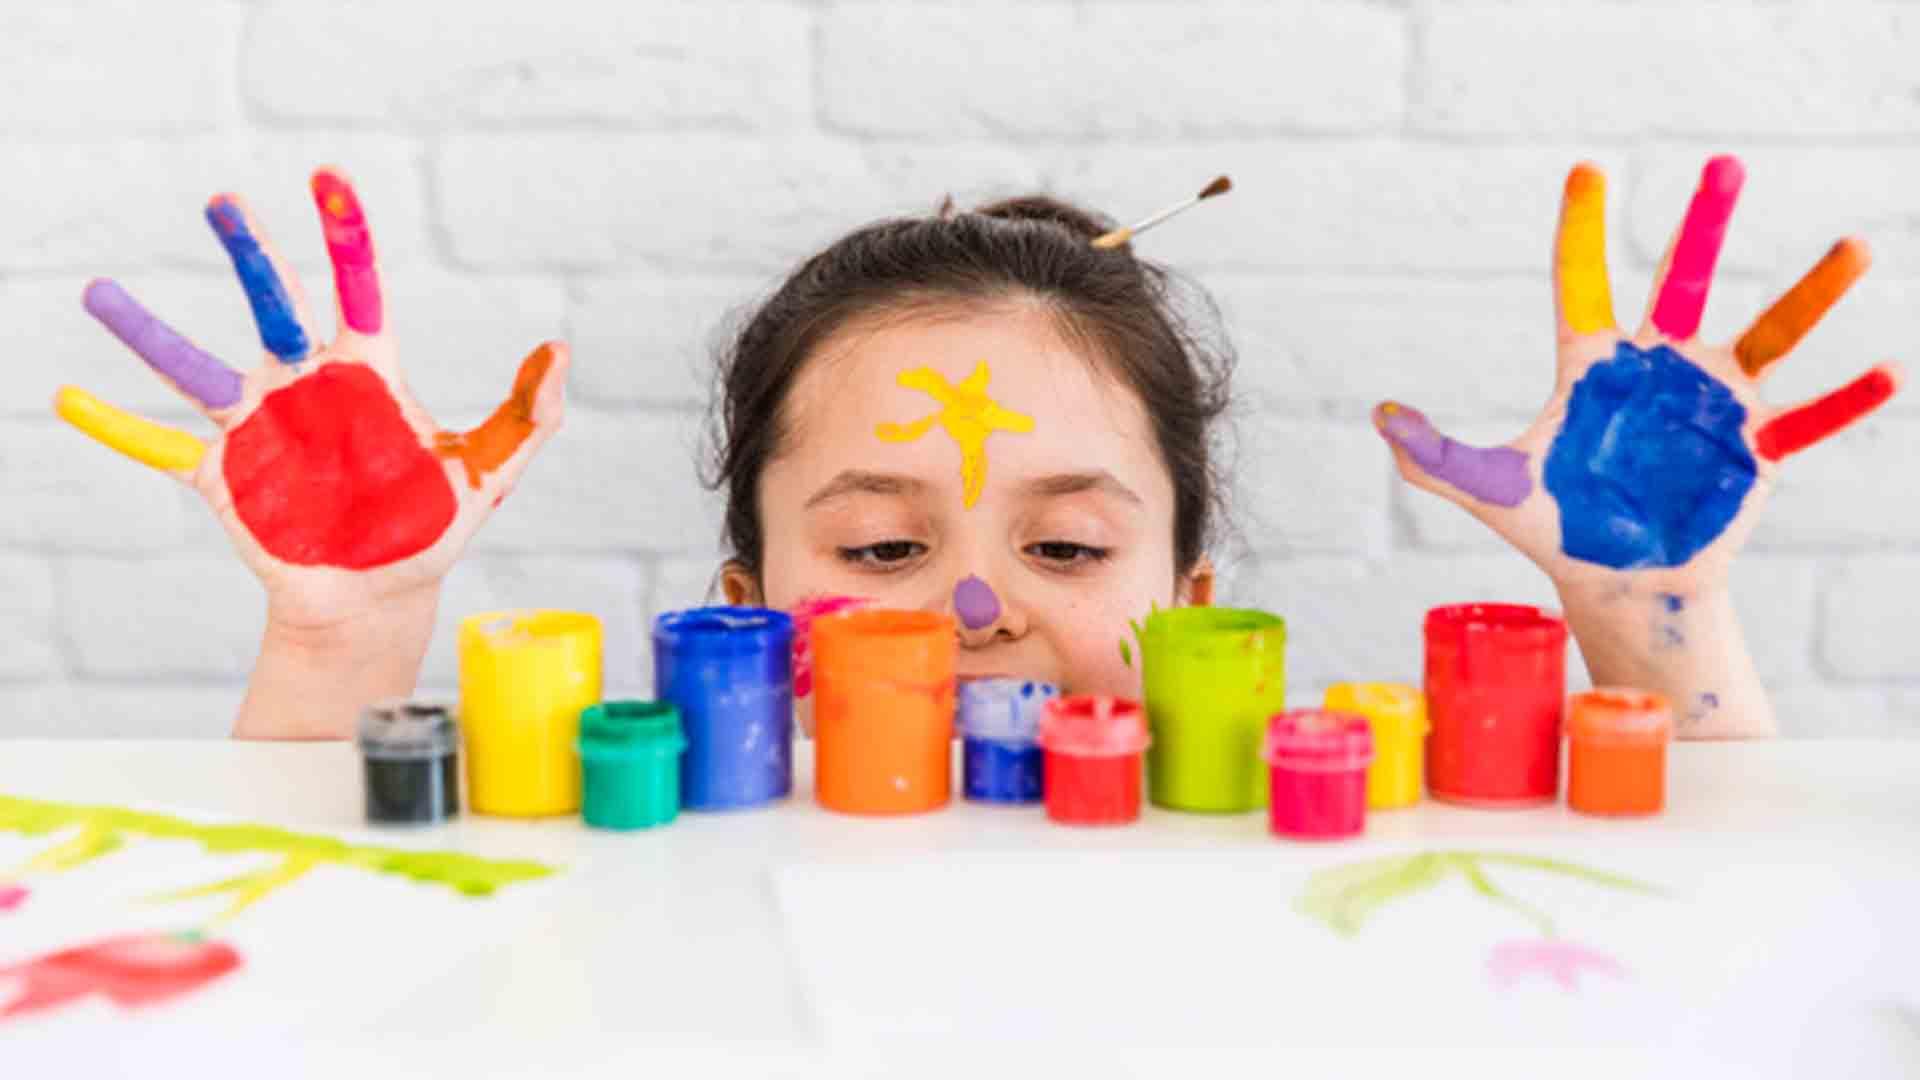 Optimalkan Perkembangan Otak Anak dengan Wyeth Nutrition